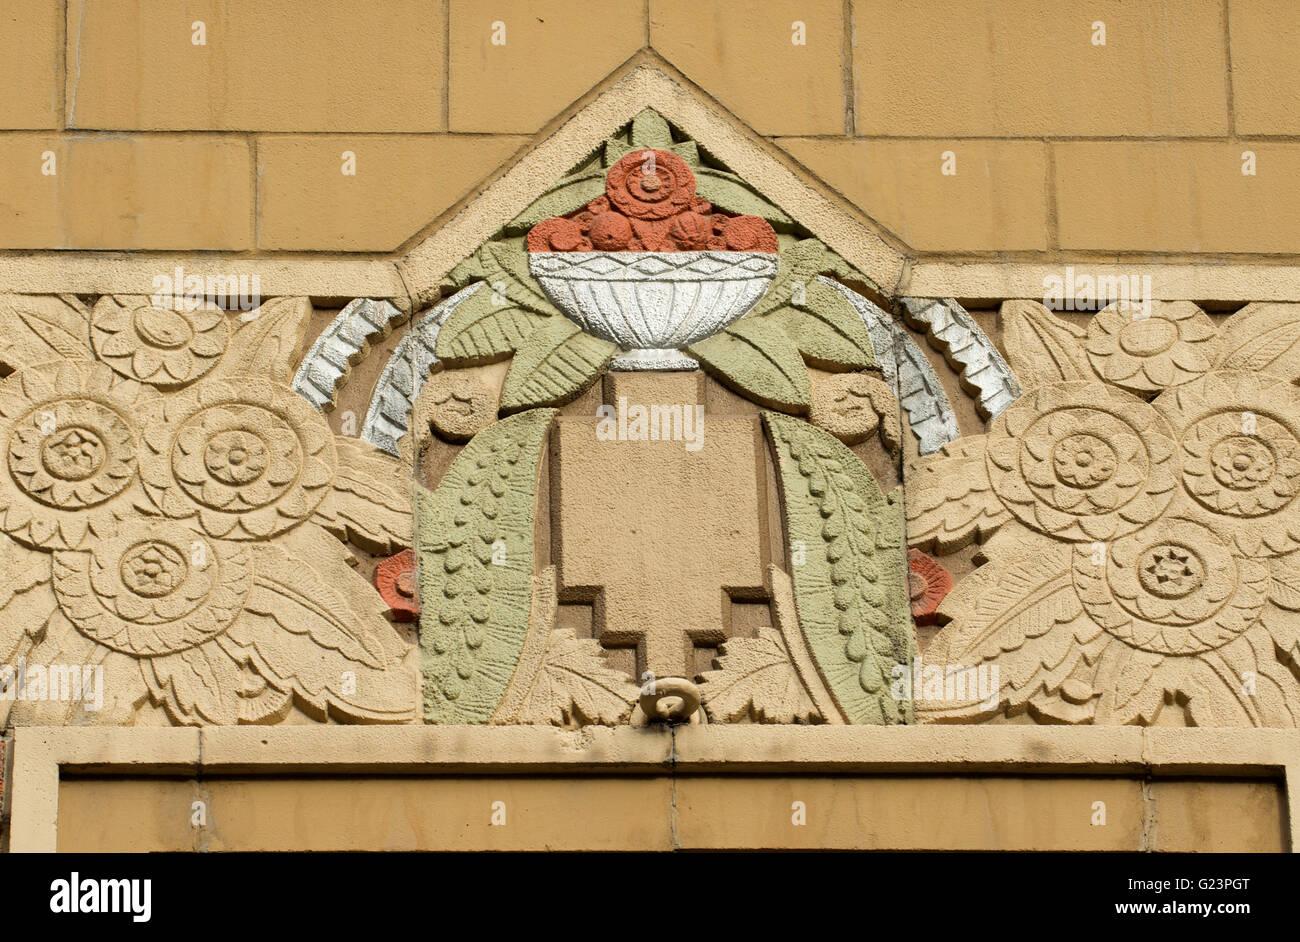 Art Deco sculpture, City Hall, Spokane, Washington Stock Photo ...